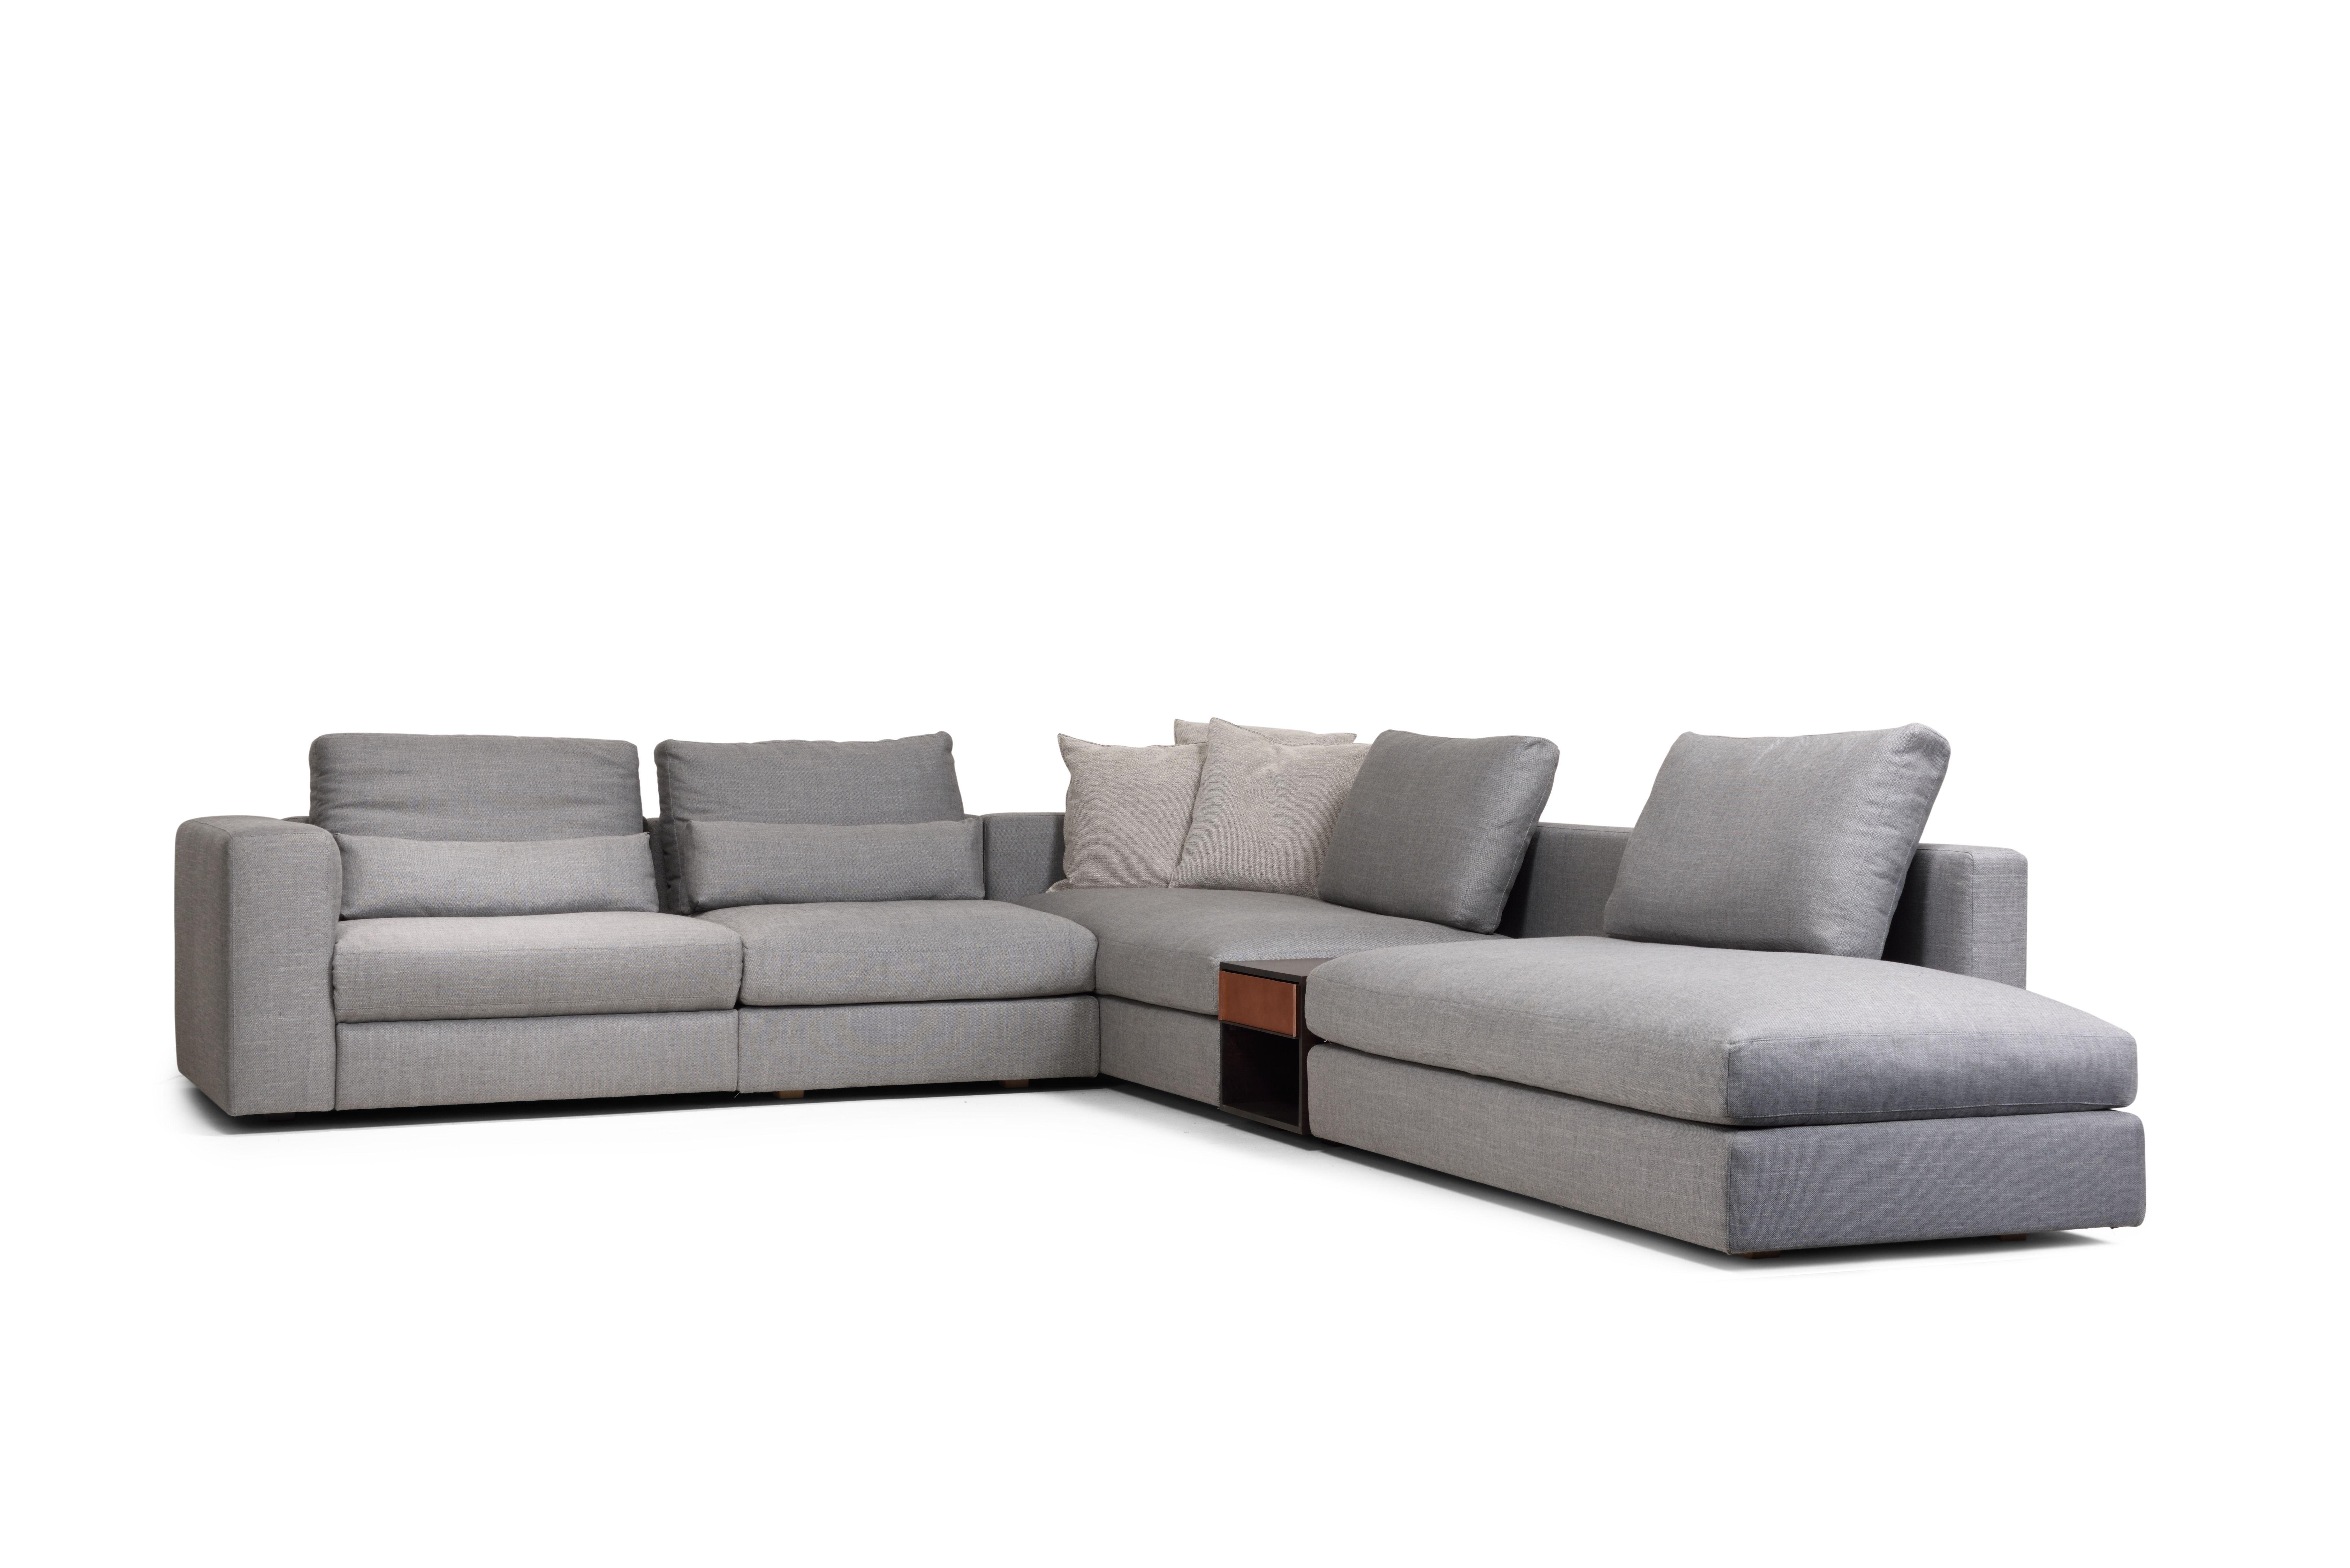 Luv Flexible Sofa By Indera Www Indera Be Lounge Sofa Sofa